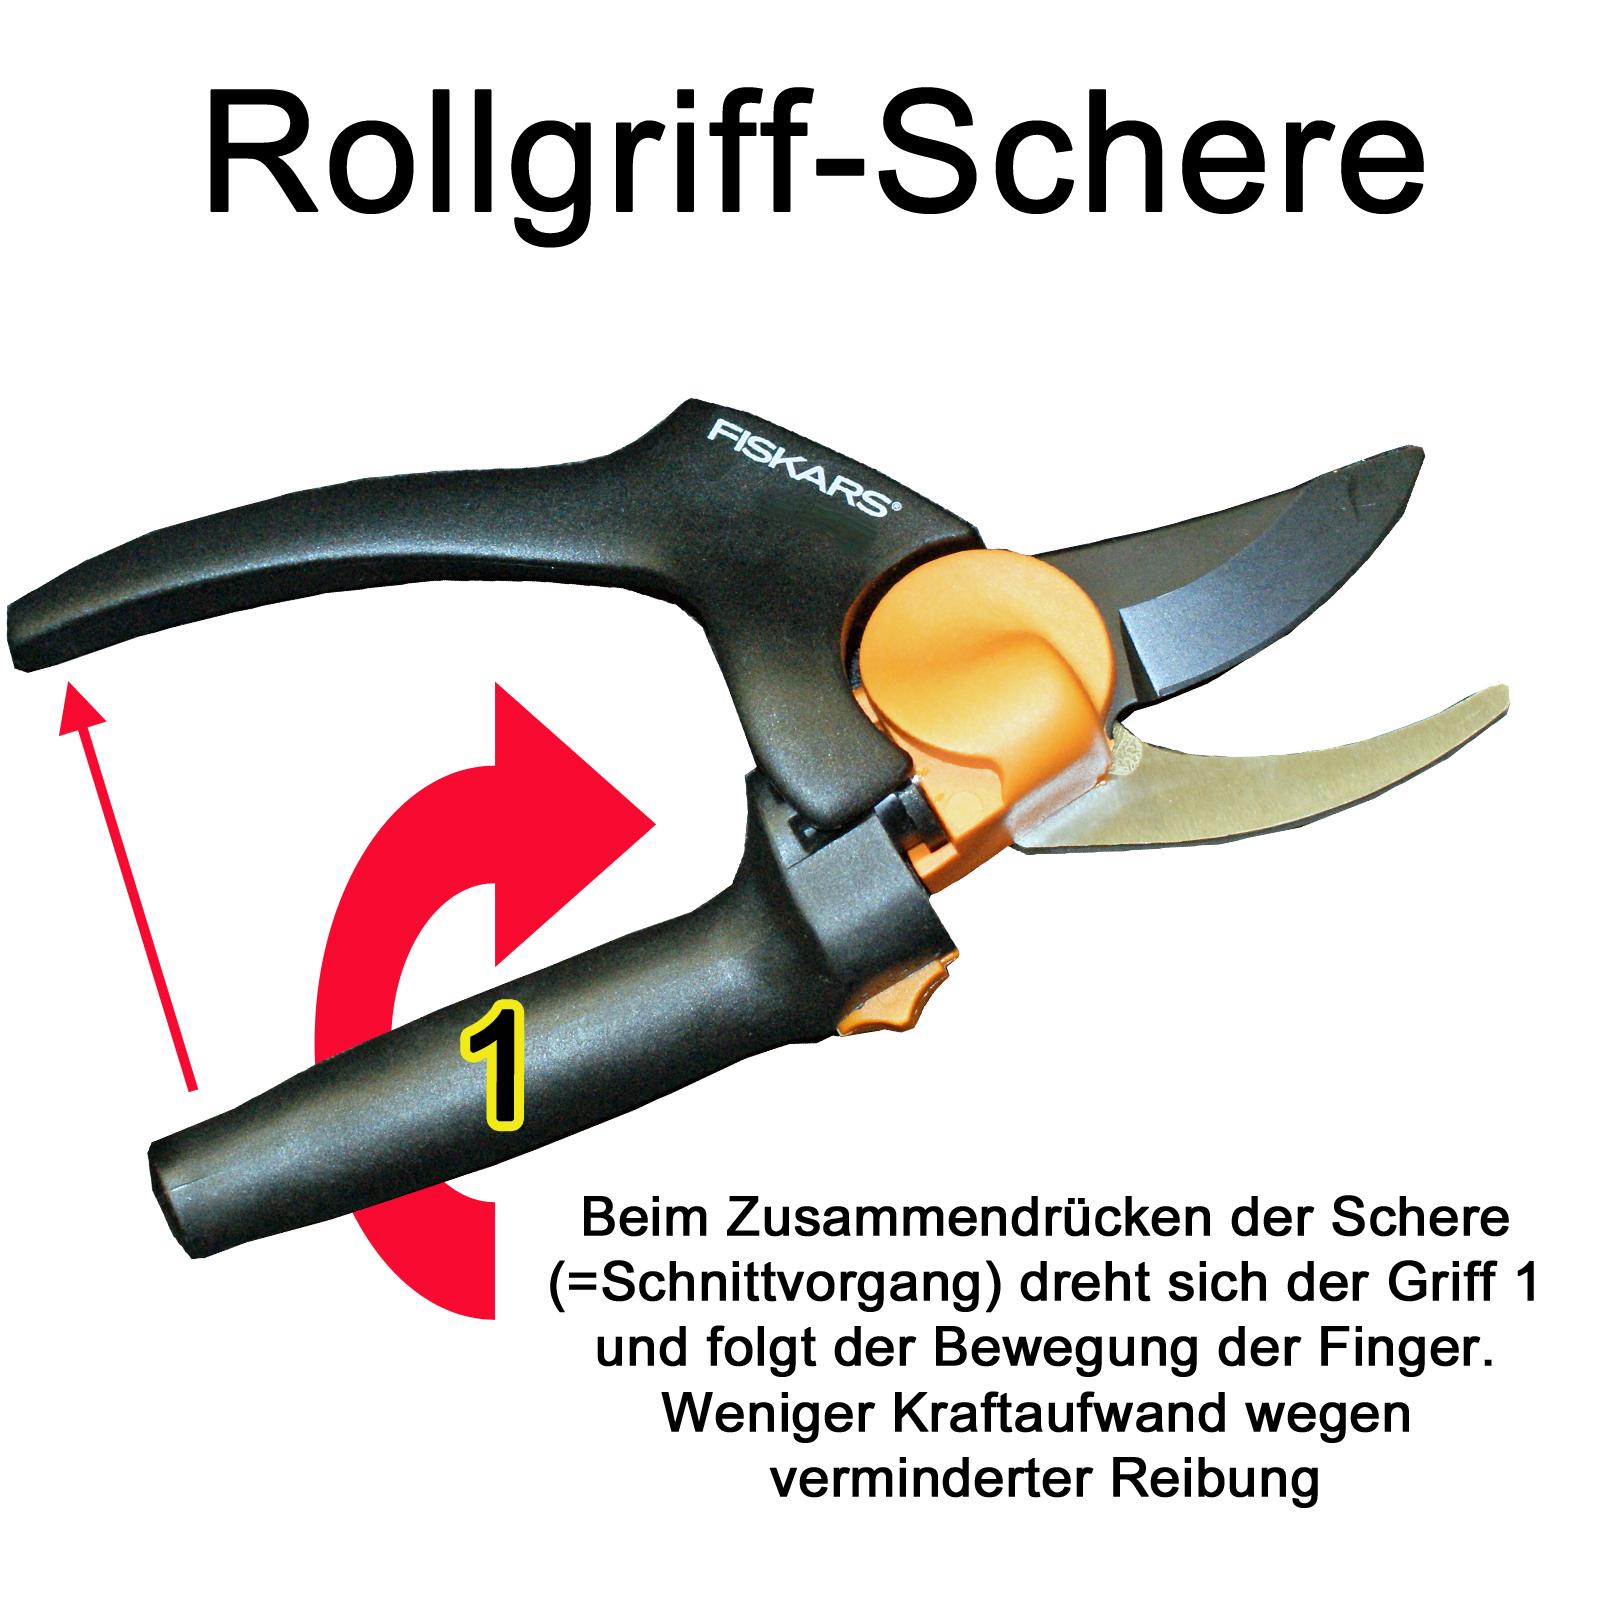 Fiskars Gartenscheren Modellauswahl Nr. 2 von 2 Grünholz / Trockenholz